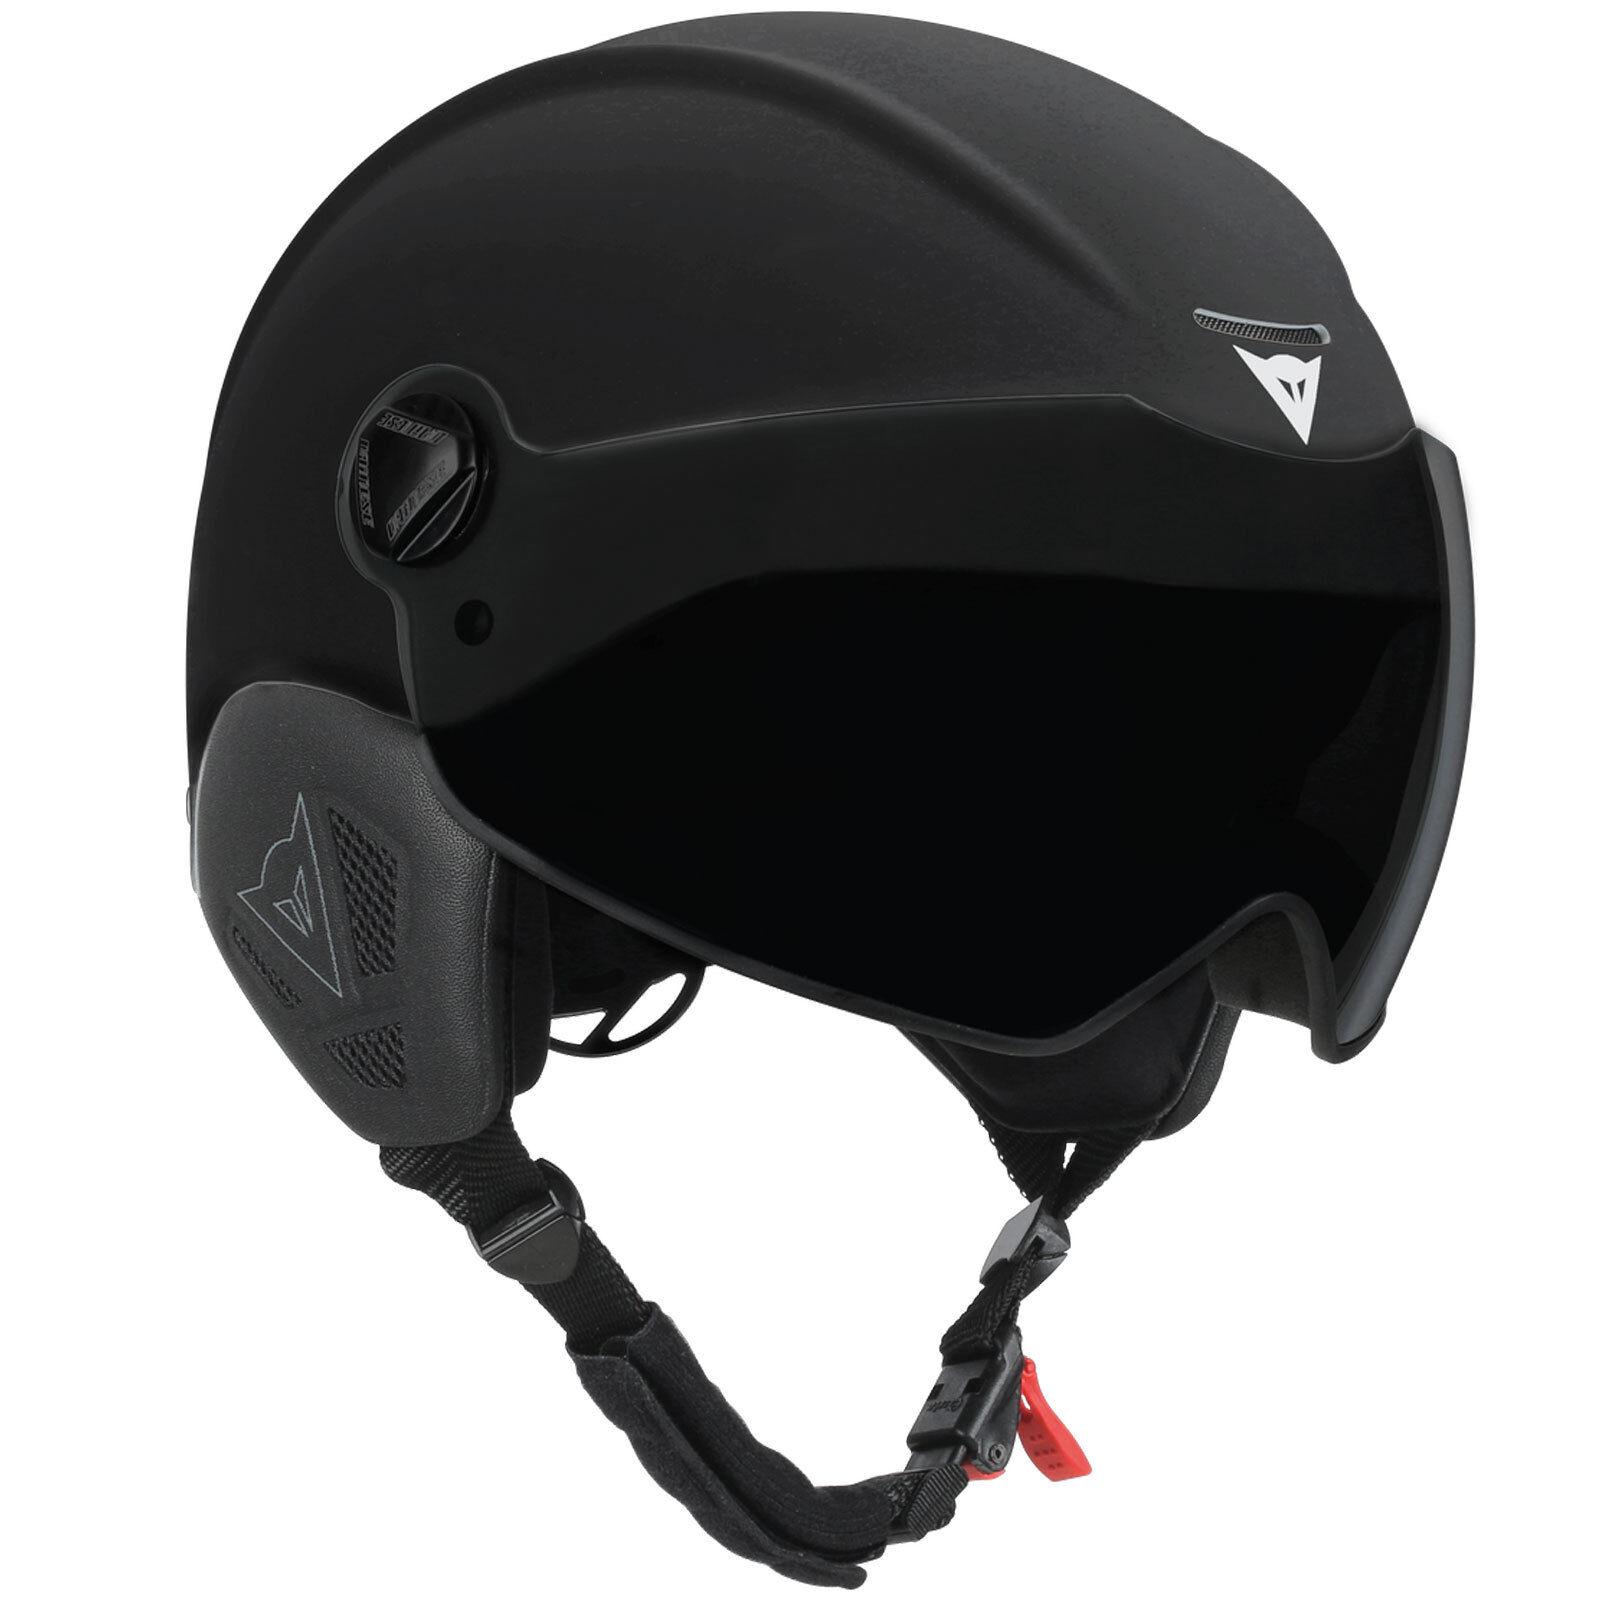 Dainese V-Vision 2 Casco de Snowboard Esquí Deportes Invierno Protección